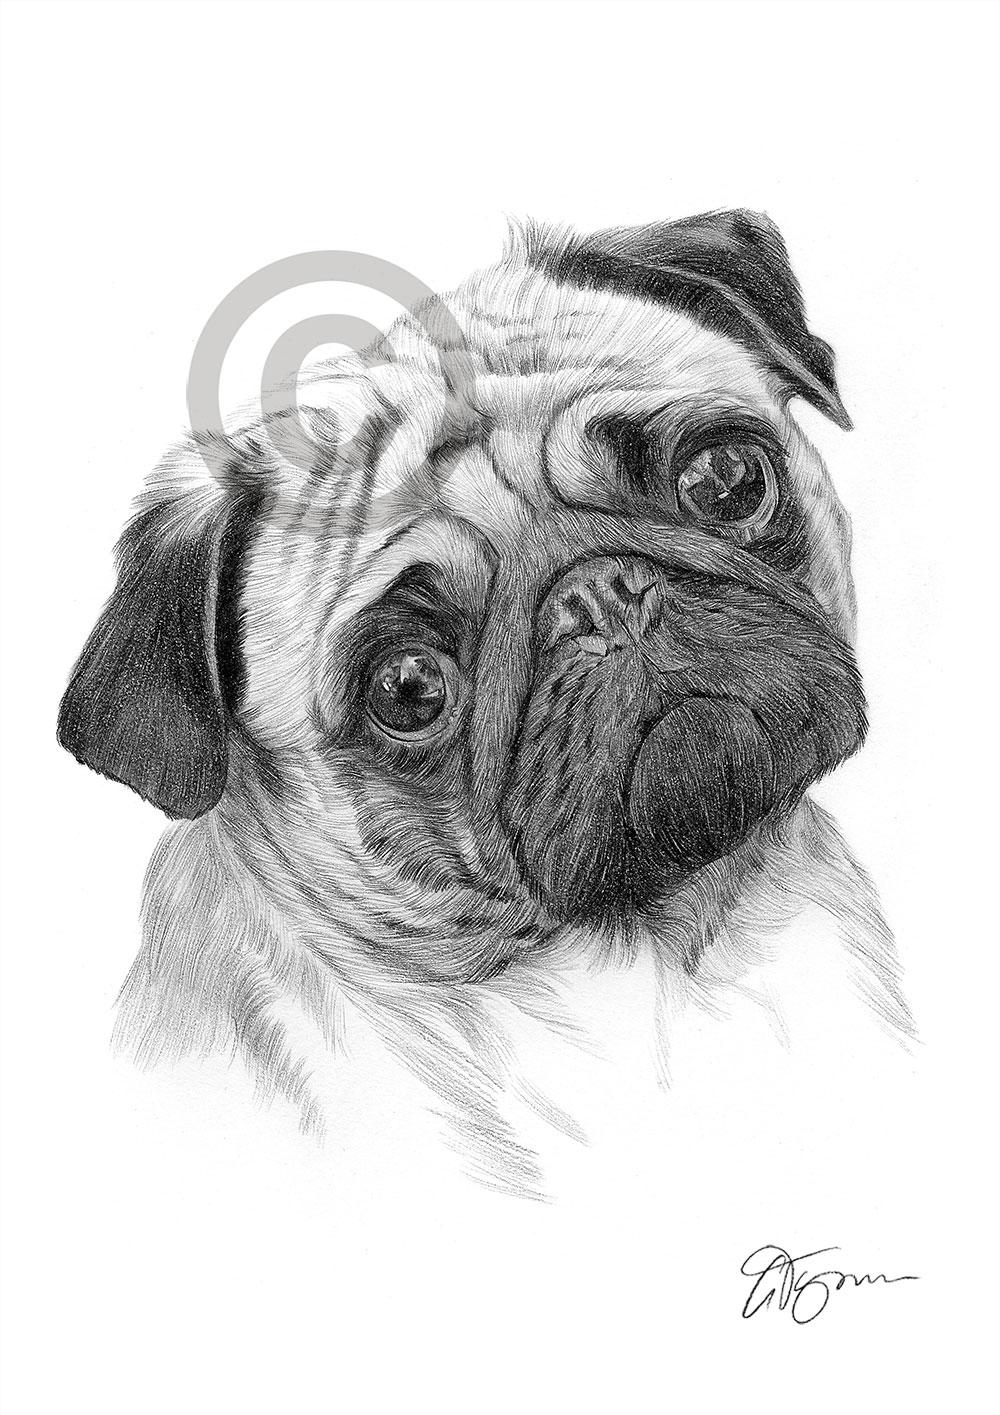 Dog And Cat Together Sketch